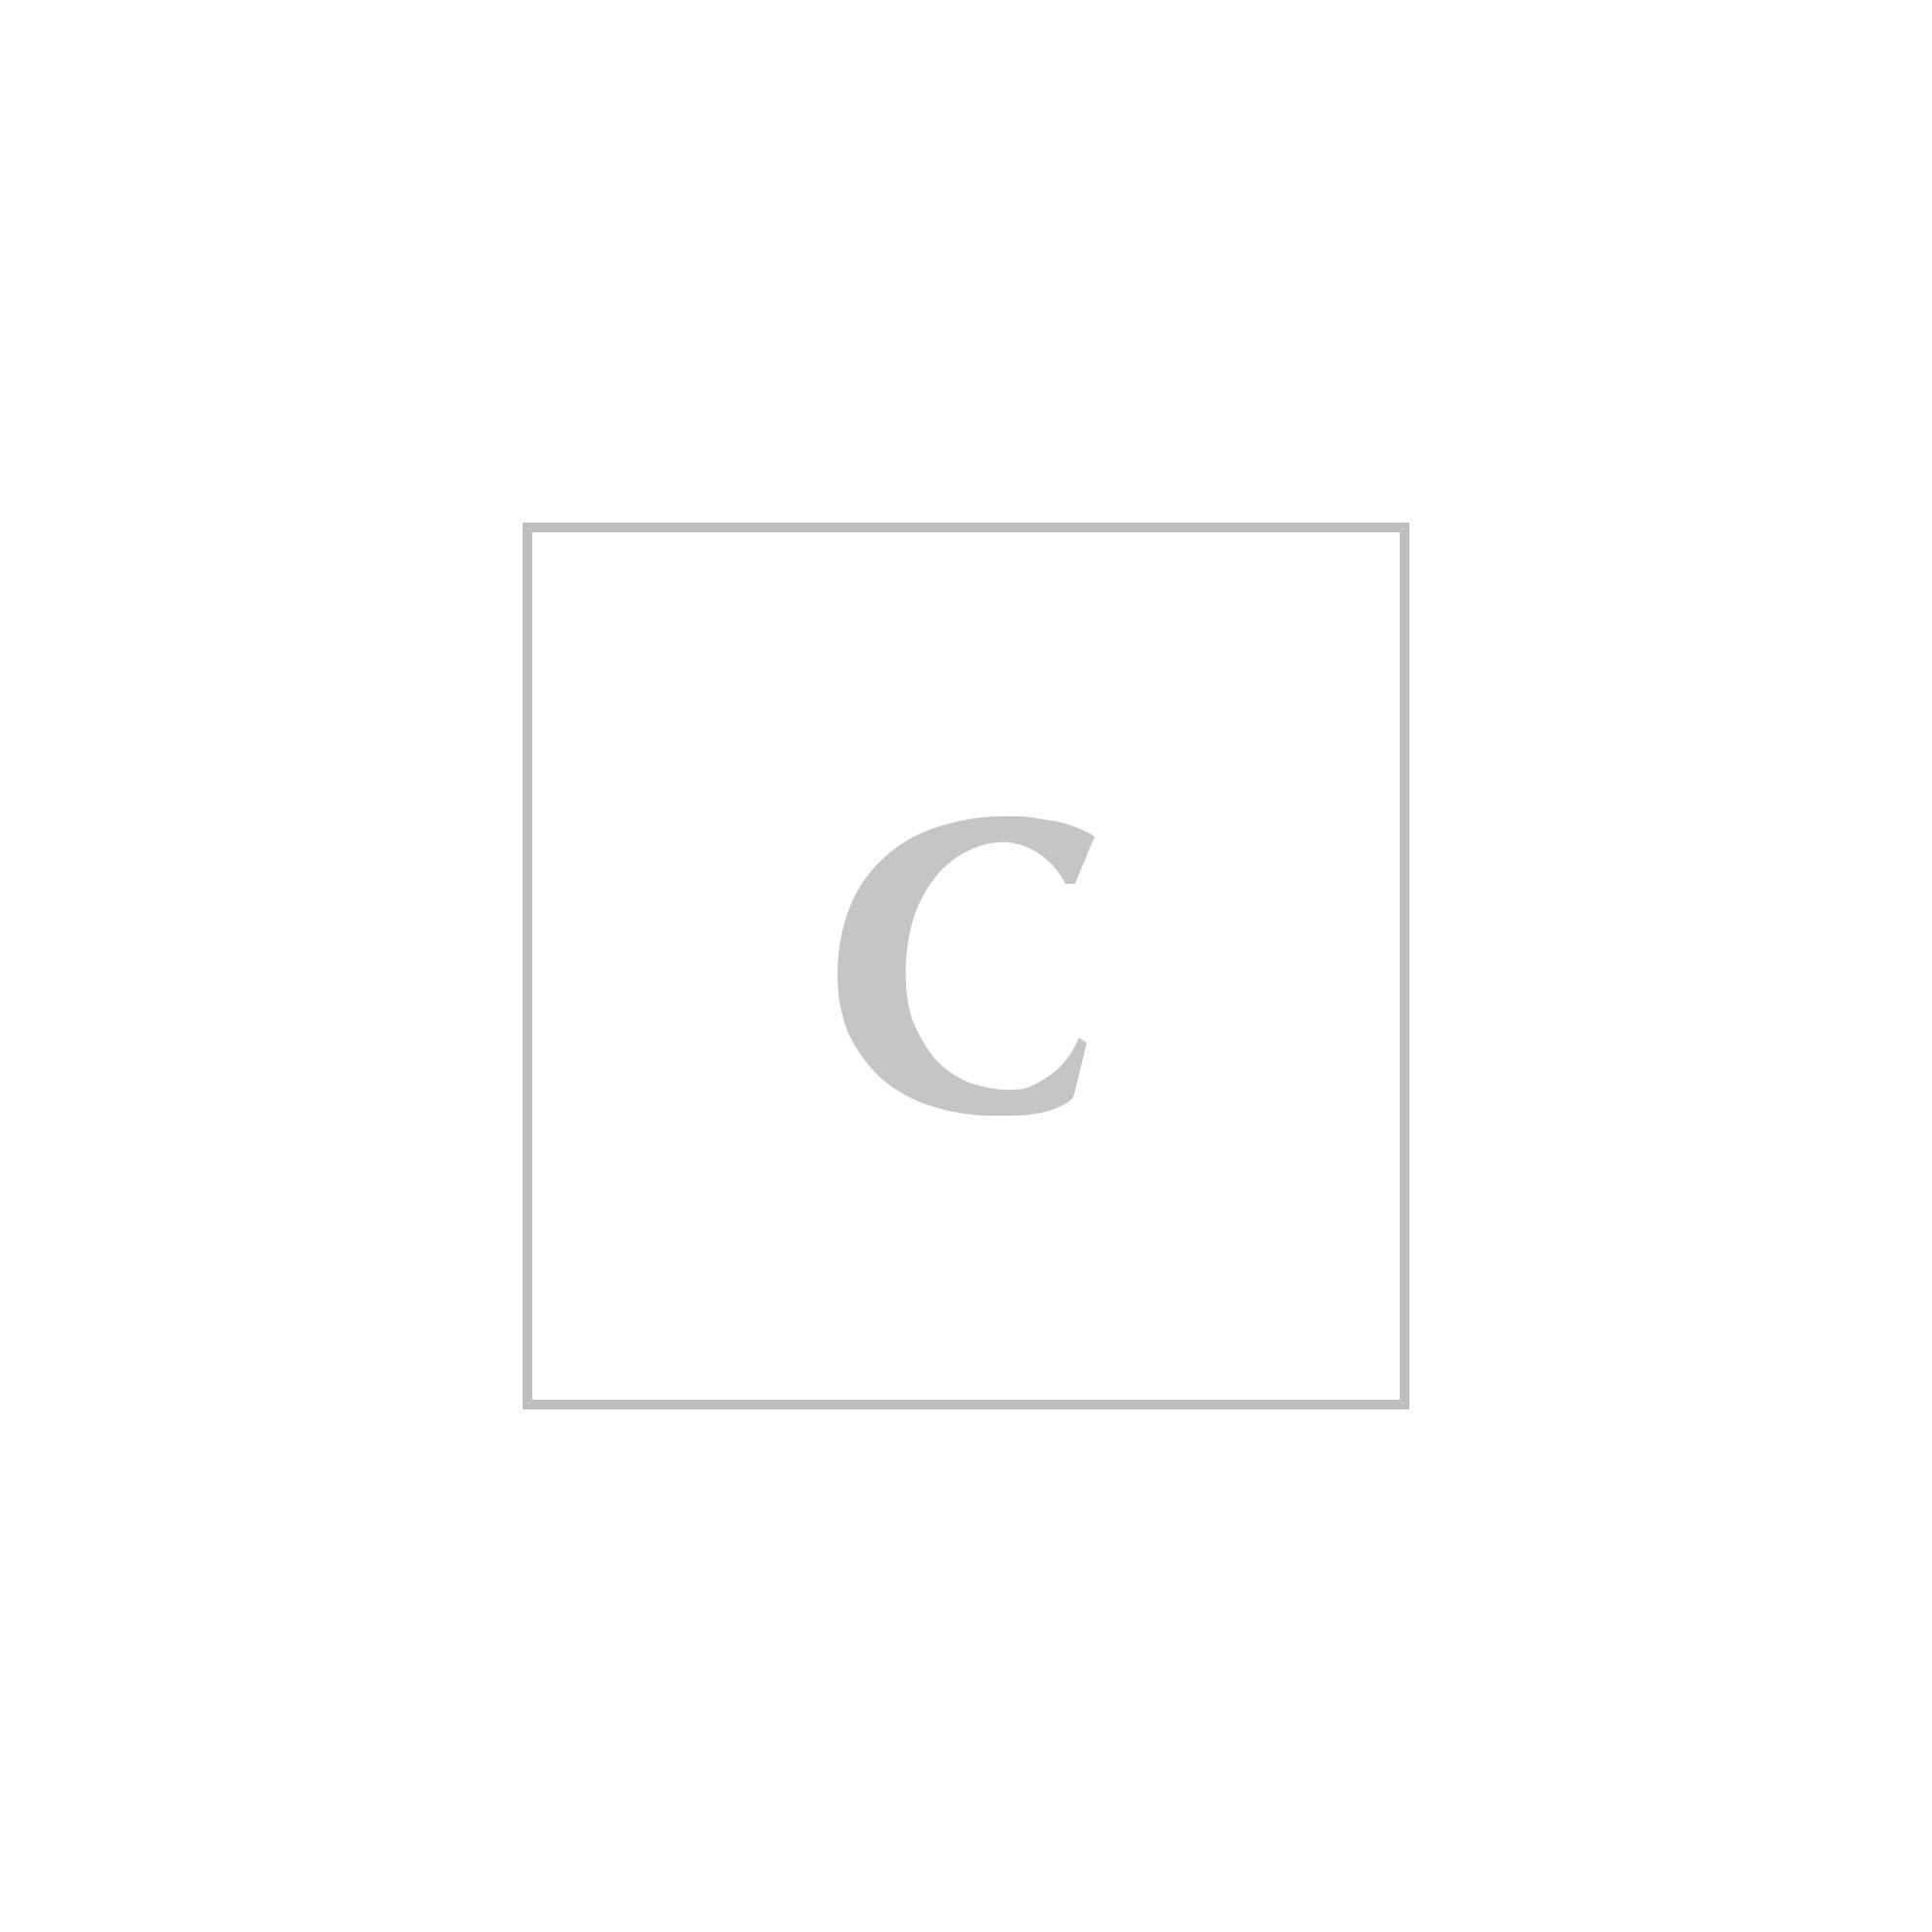 Dolce & gabbana logo nylon beltbag